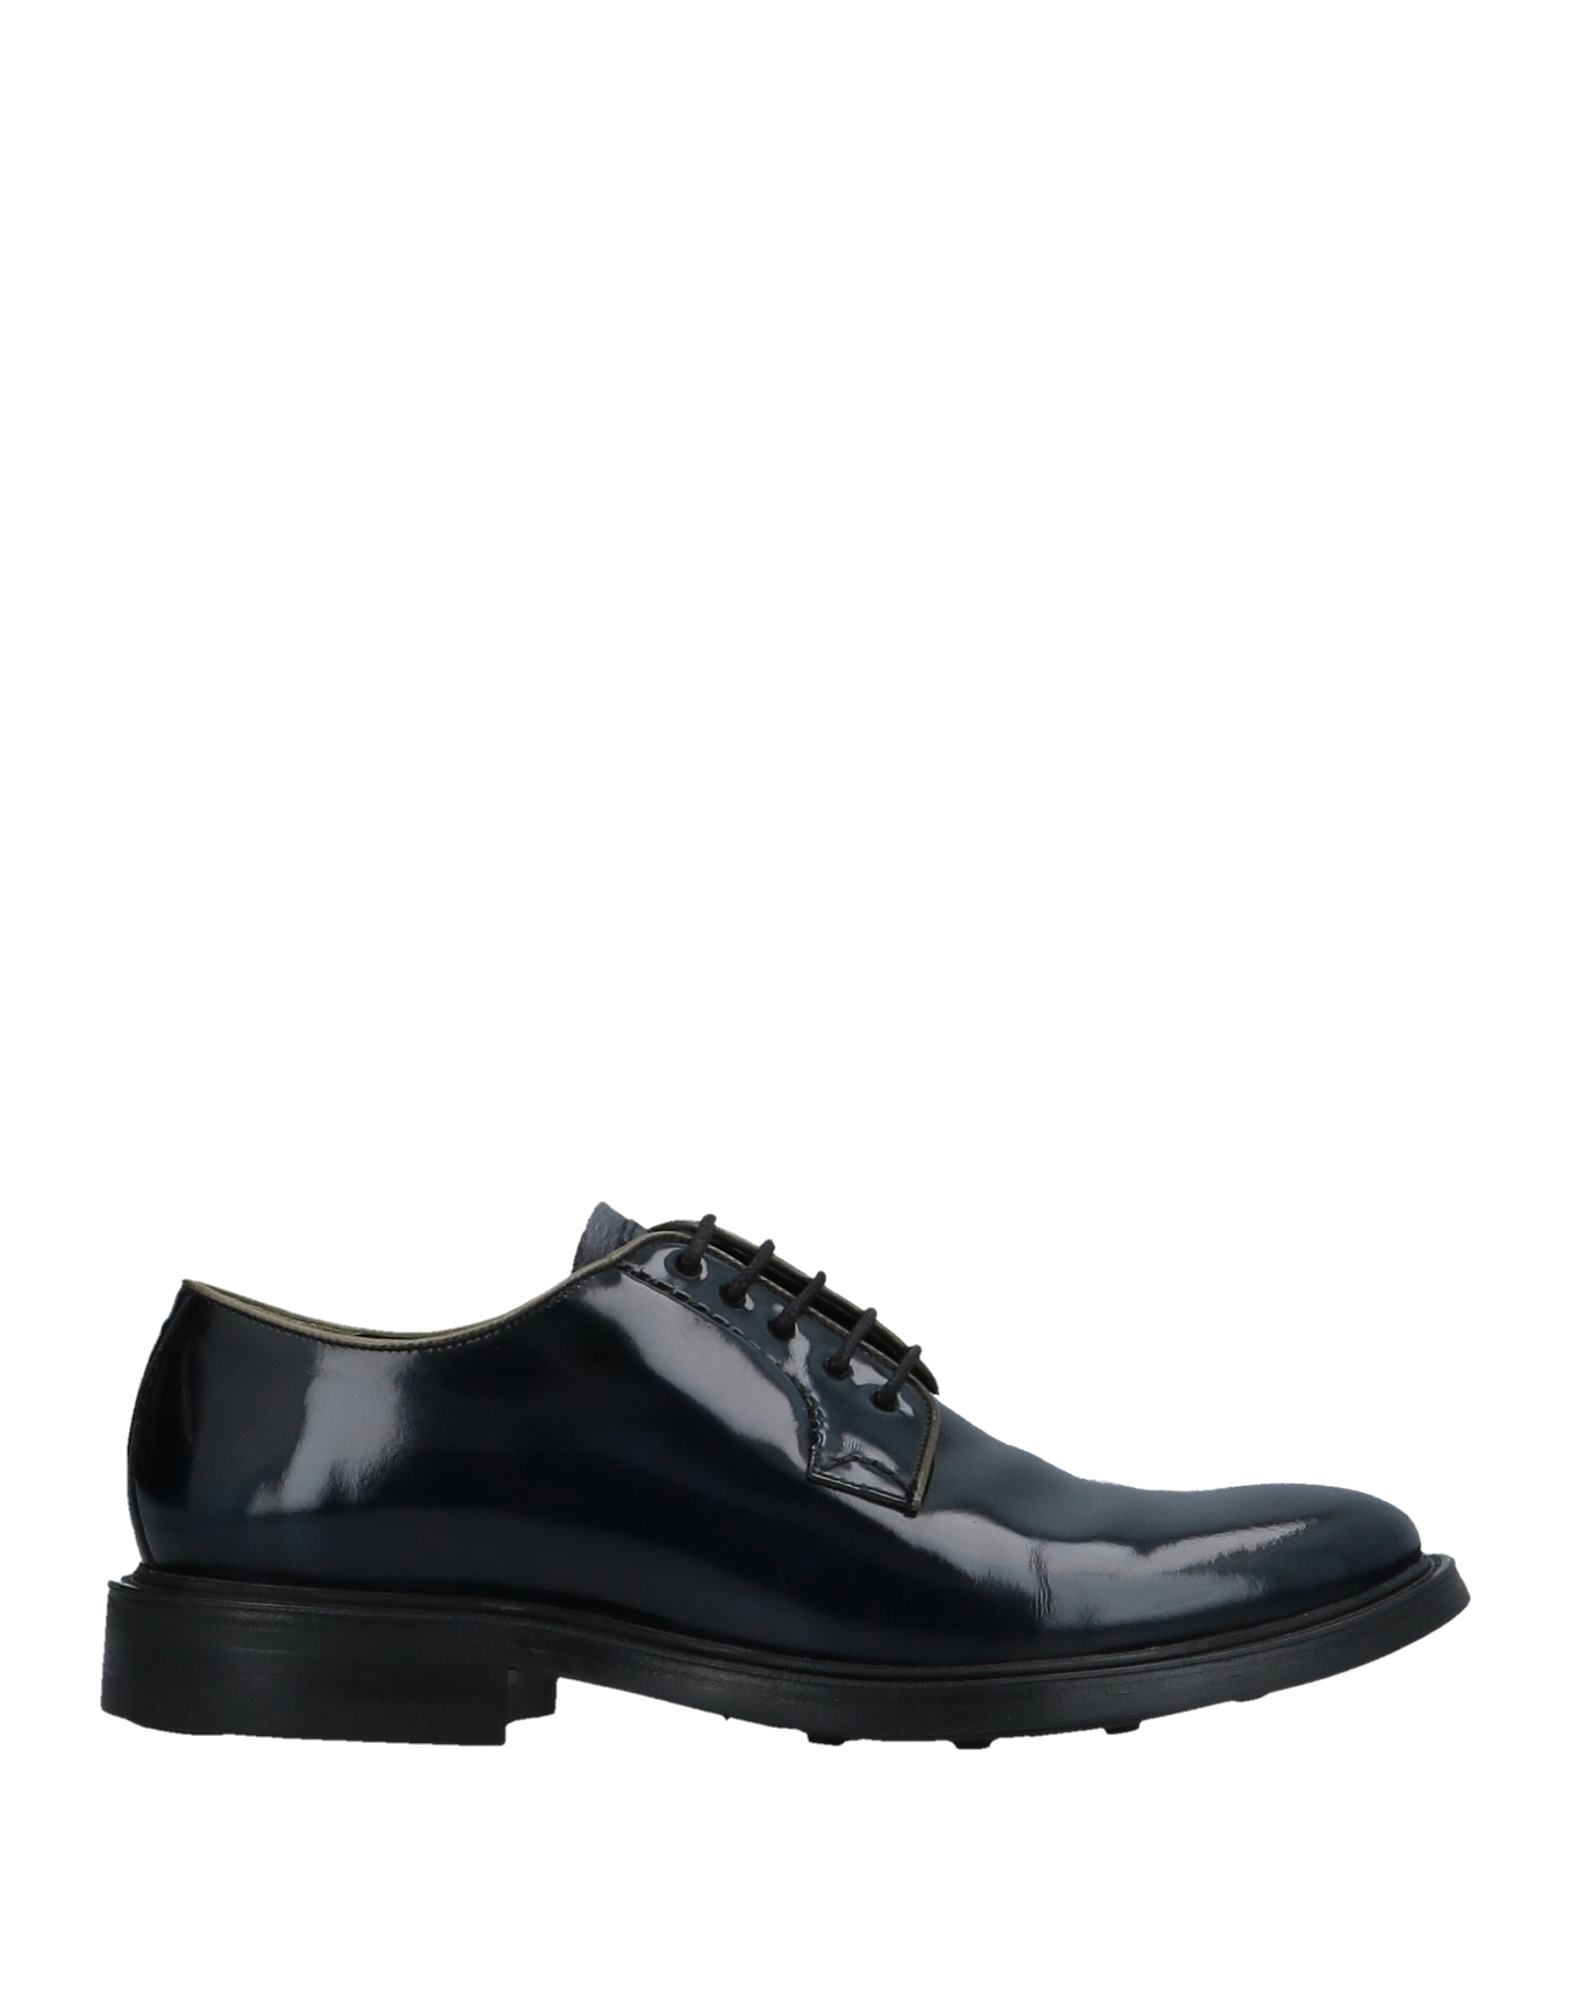 Rabatt echte Schuhe Brecos Schnürschuhe Herren  11505066VR